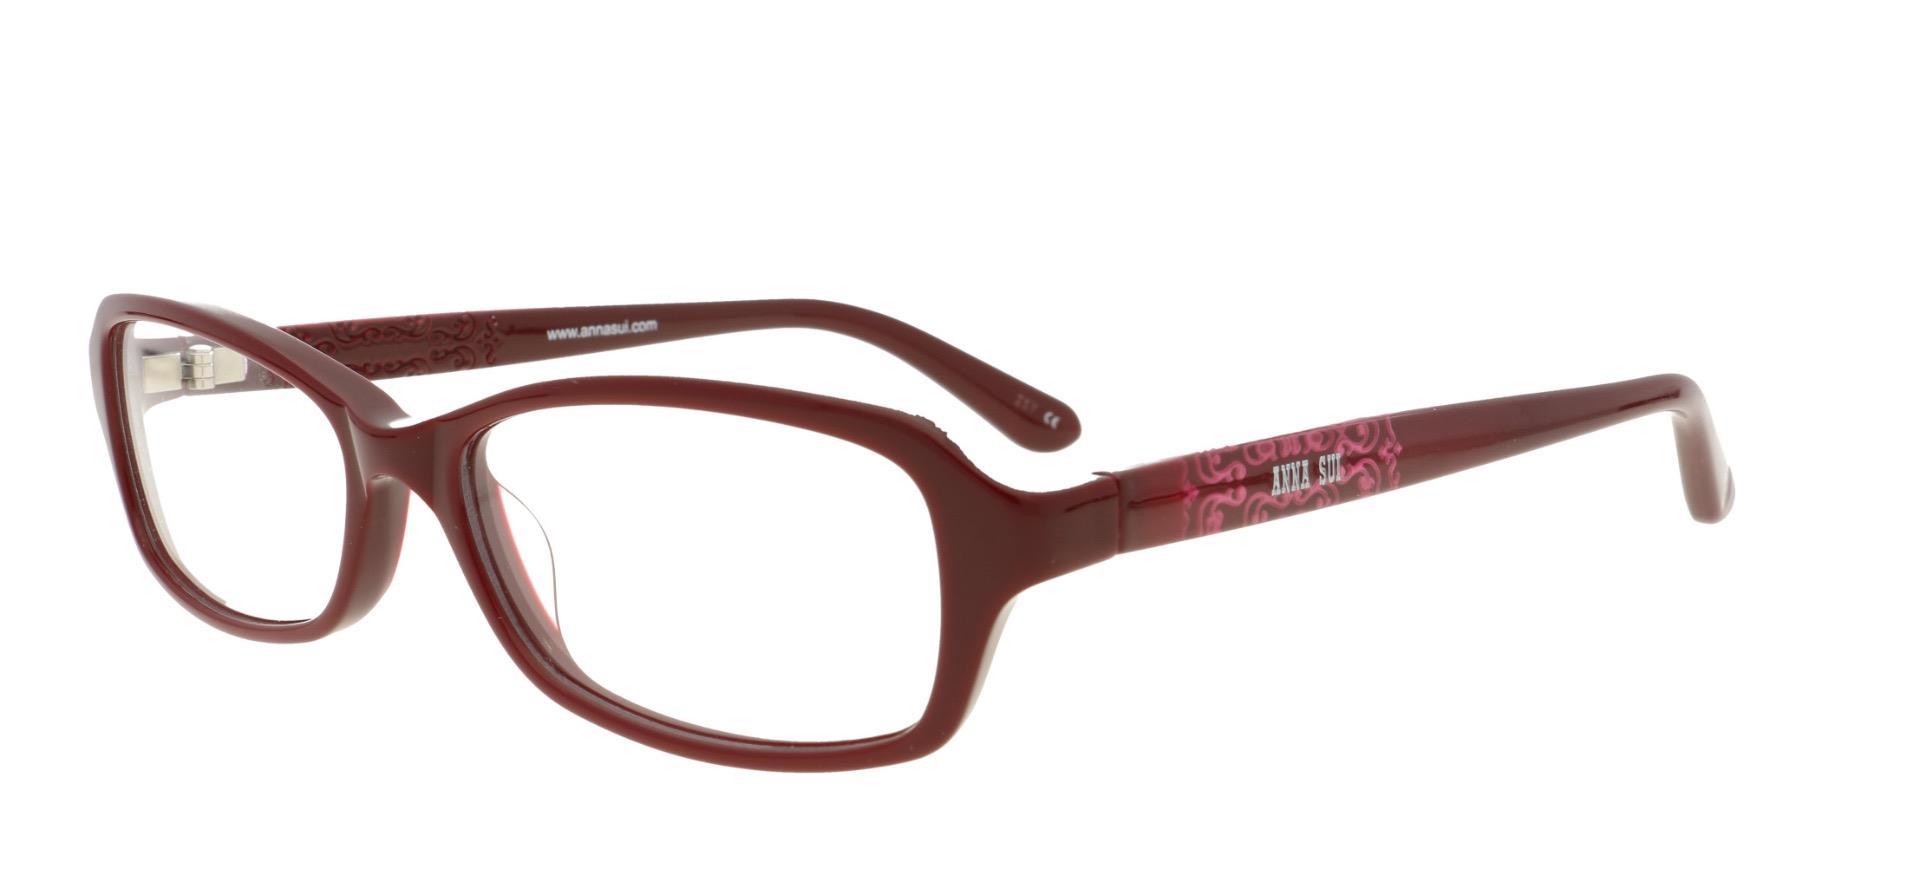 a129d7a637 Anna Sui AS 595 279 Glasses Spectacles RX Optical Frames + Case + ...